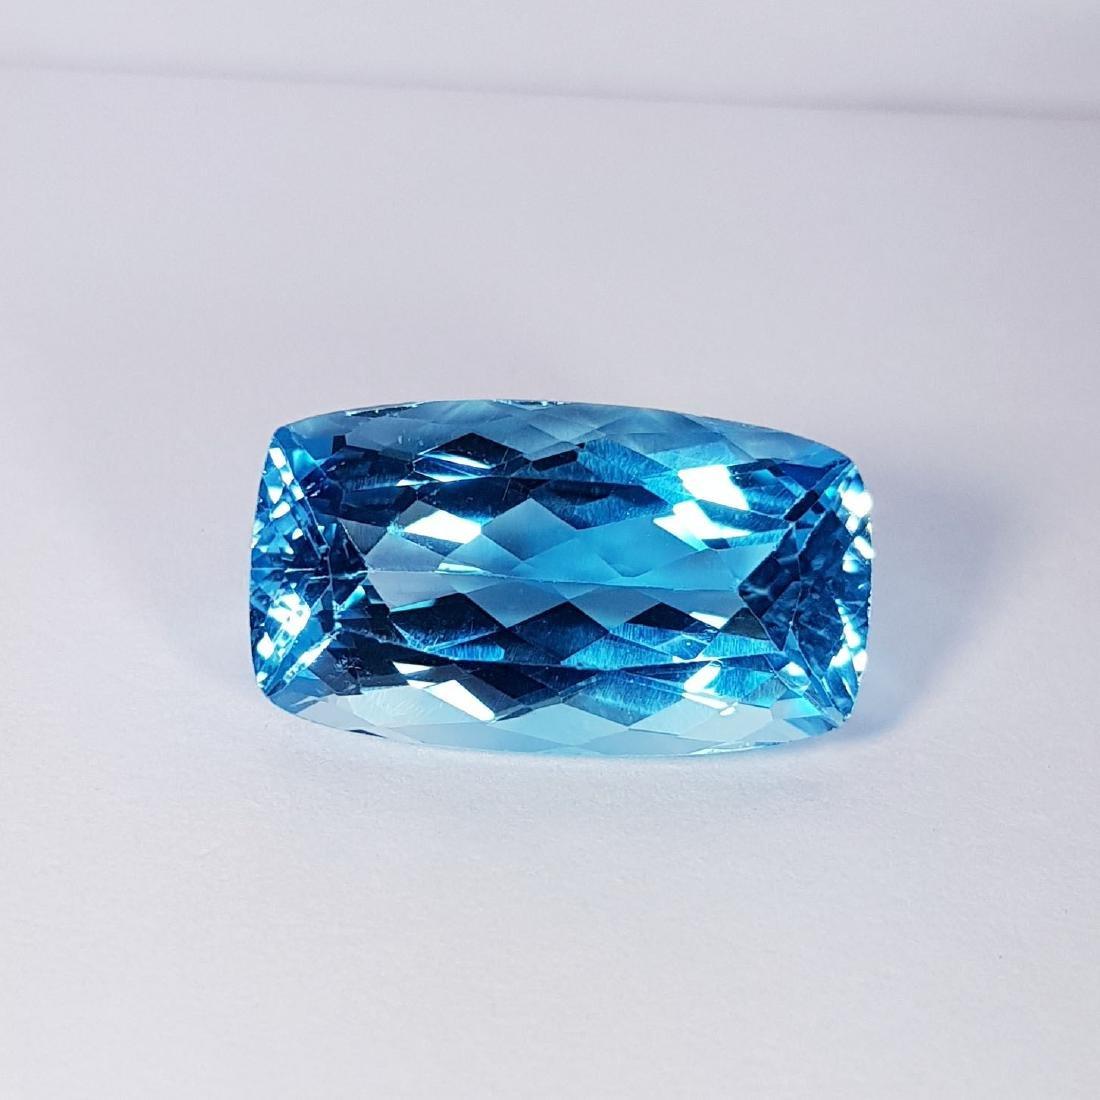 Natural Swiss Blue Topaz - 25.16 ct - 2